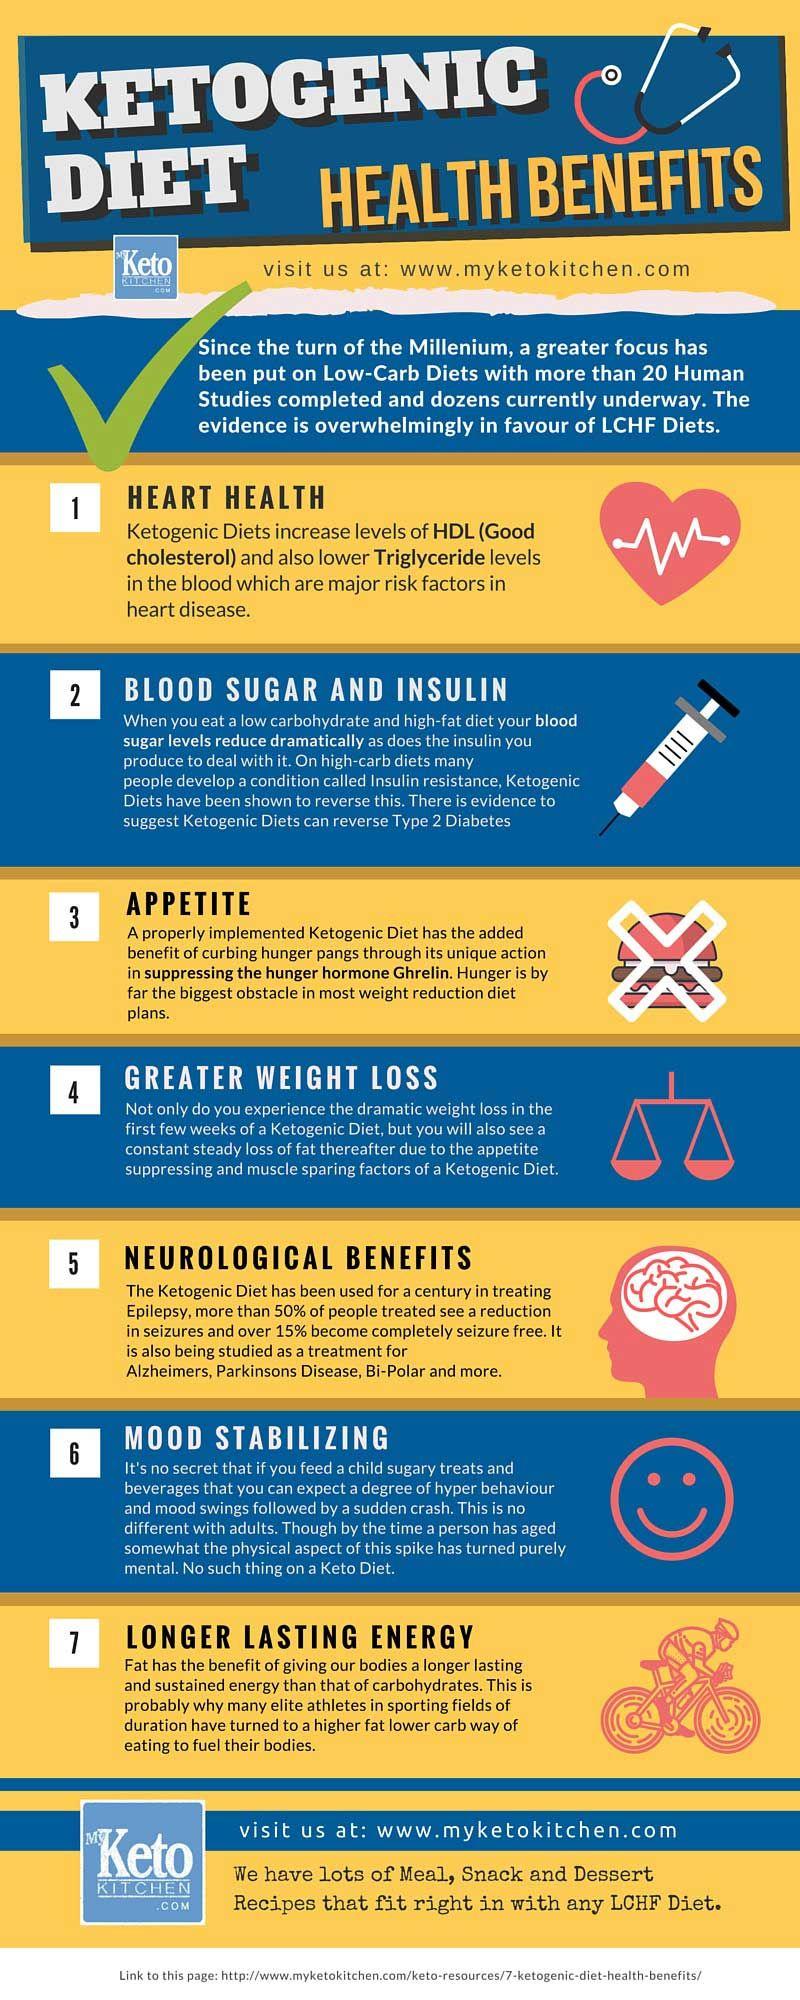 Health Benefits of Ketogenic Diet